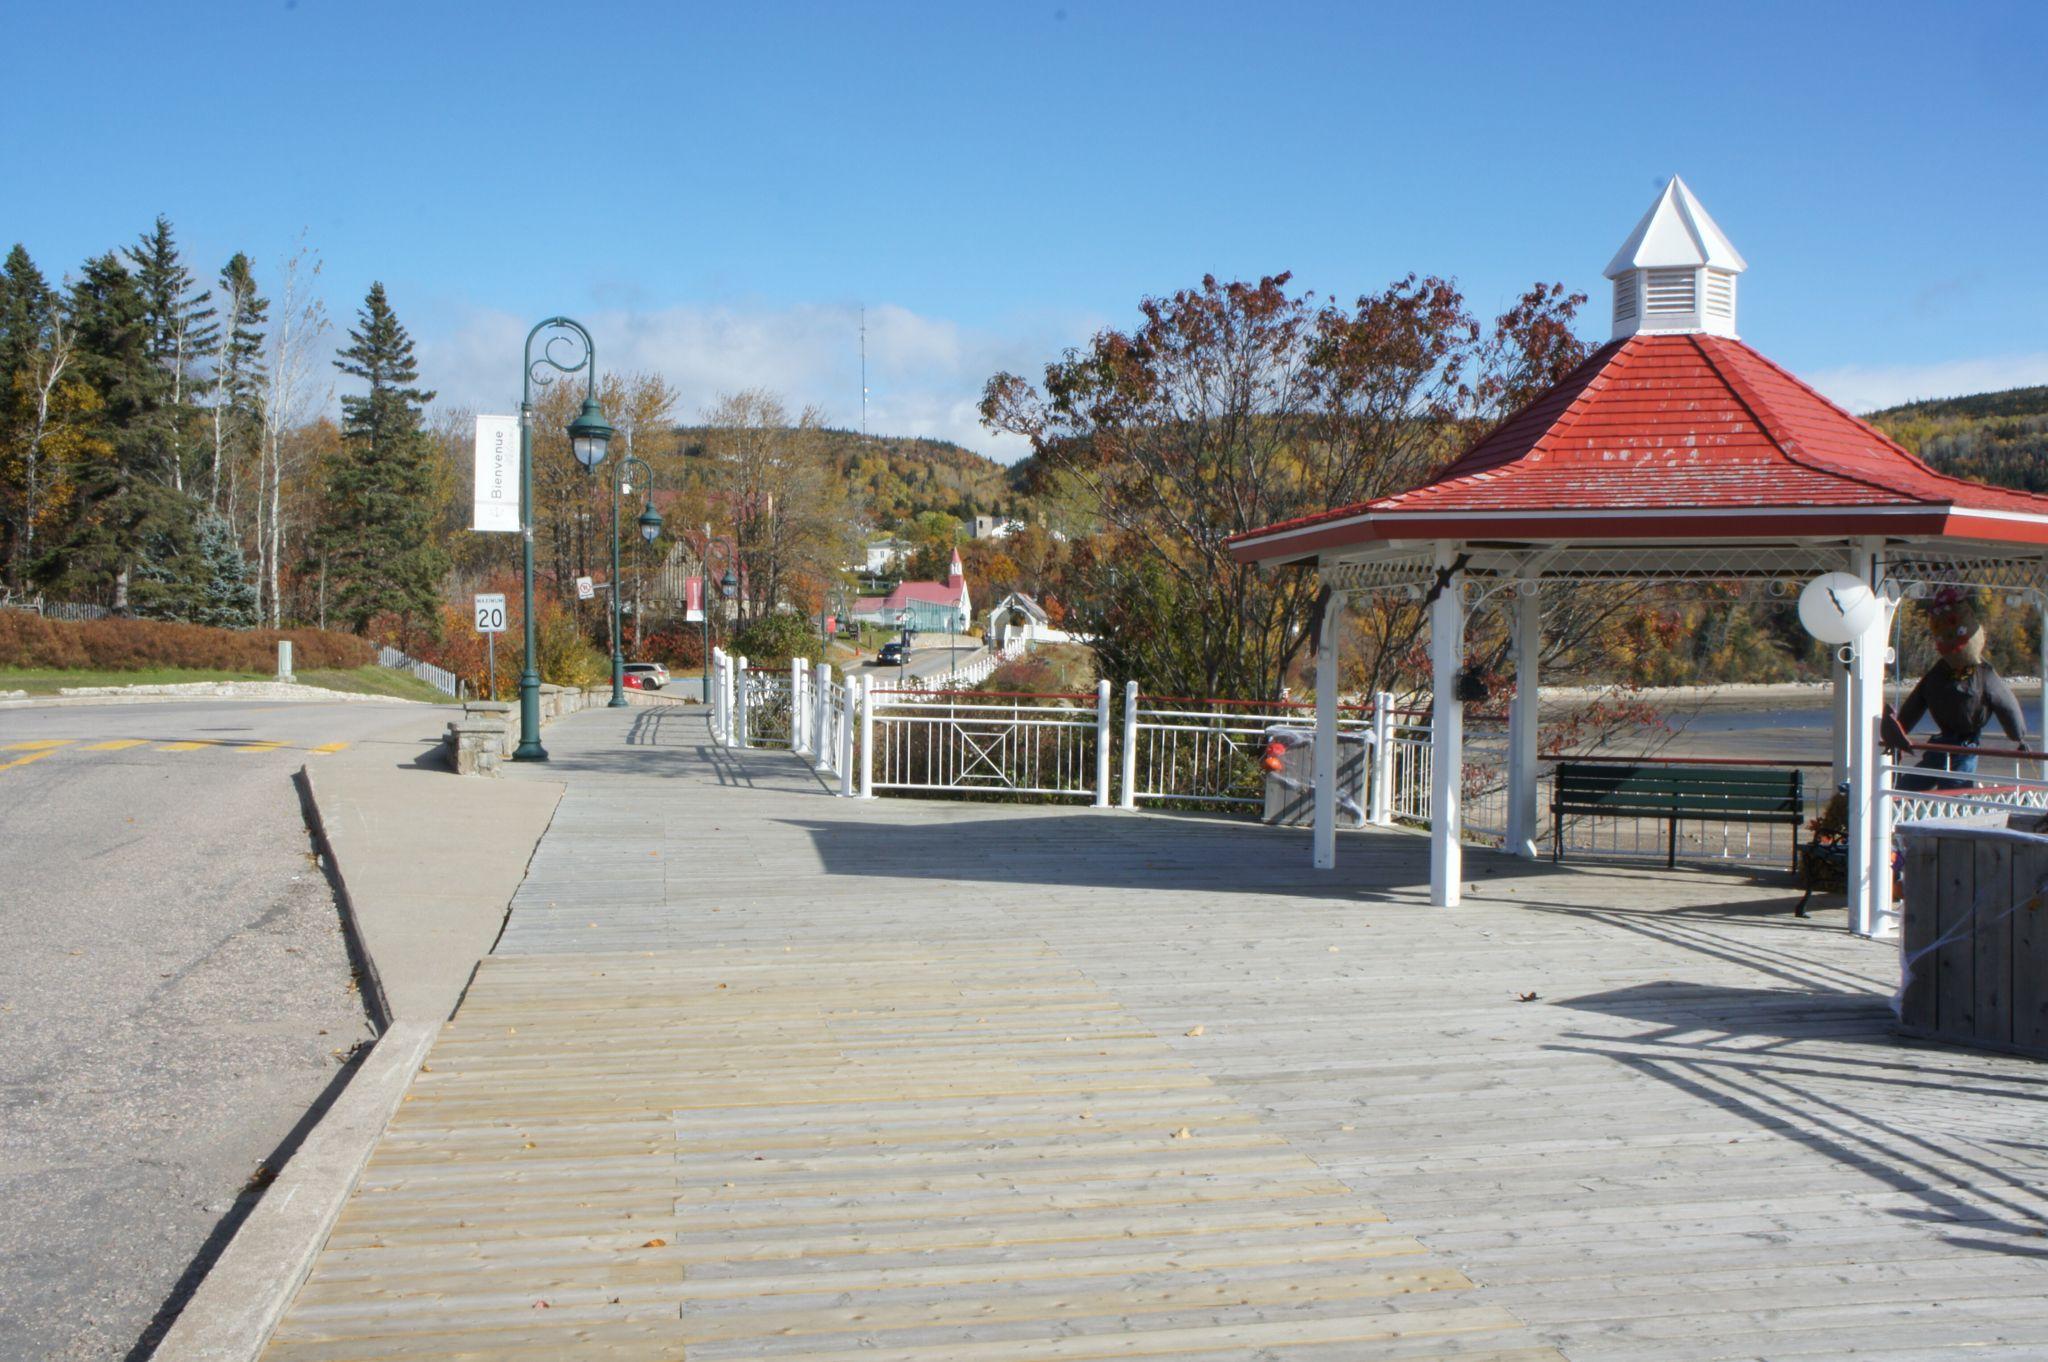 La promenade du bord de l'eau, partie nord.